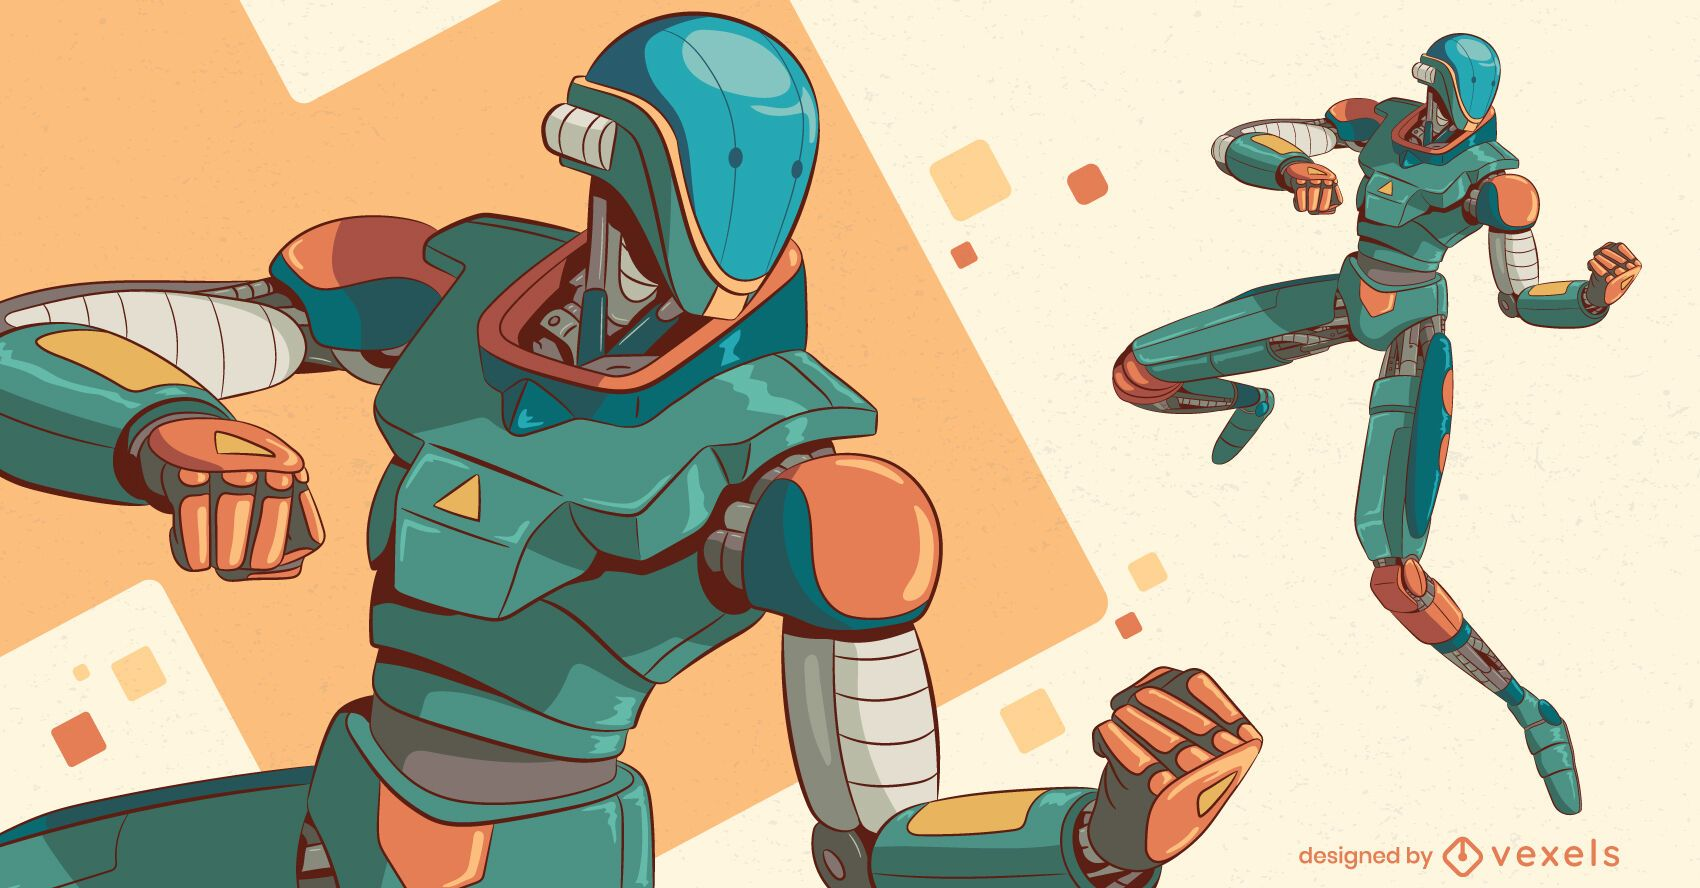 Lucha contra el diseño de personajes de robots